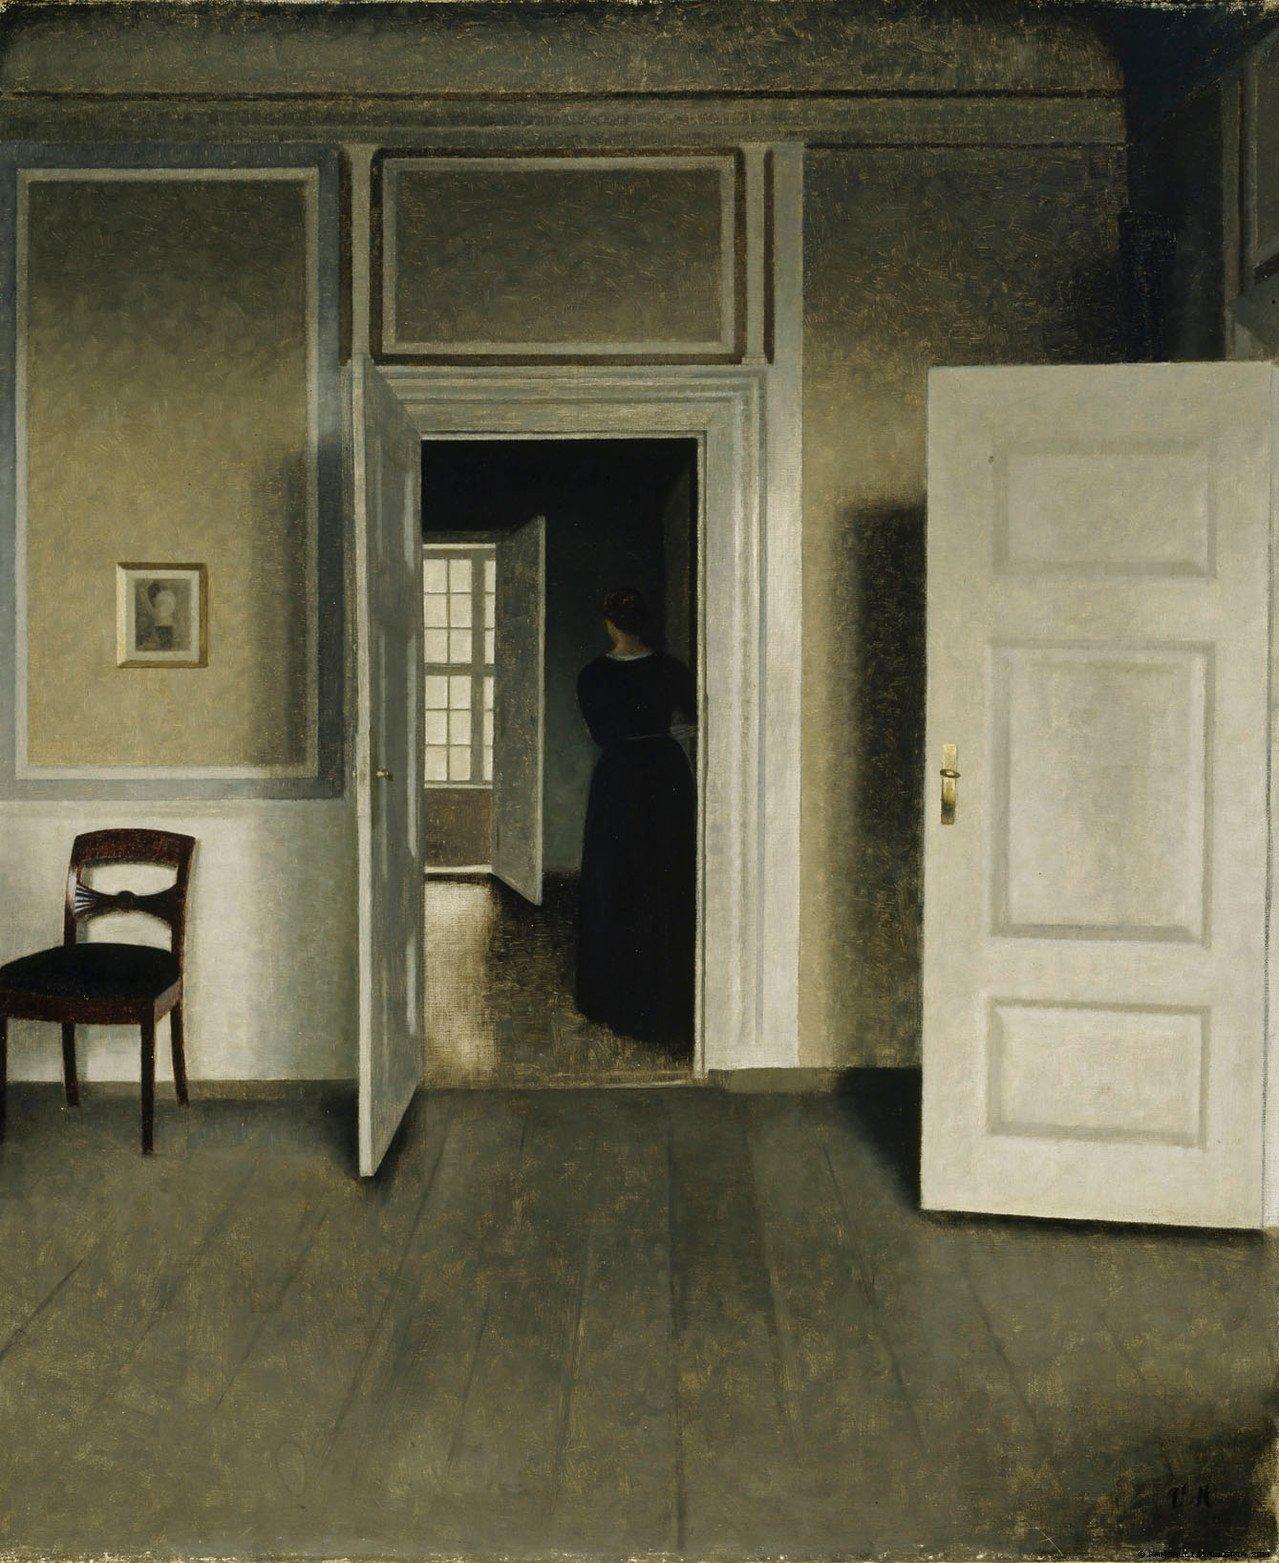 Vilhelm Hammershoi: Interior Strandgade 30